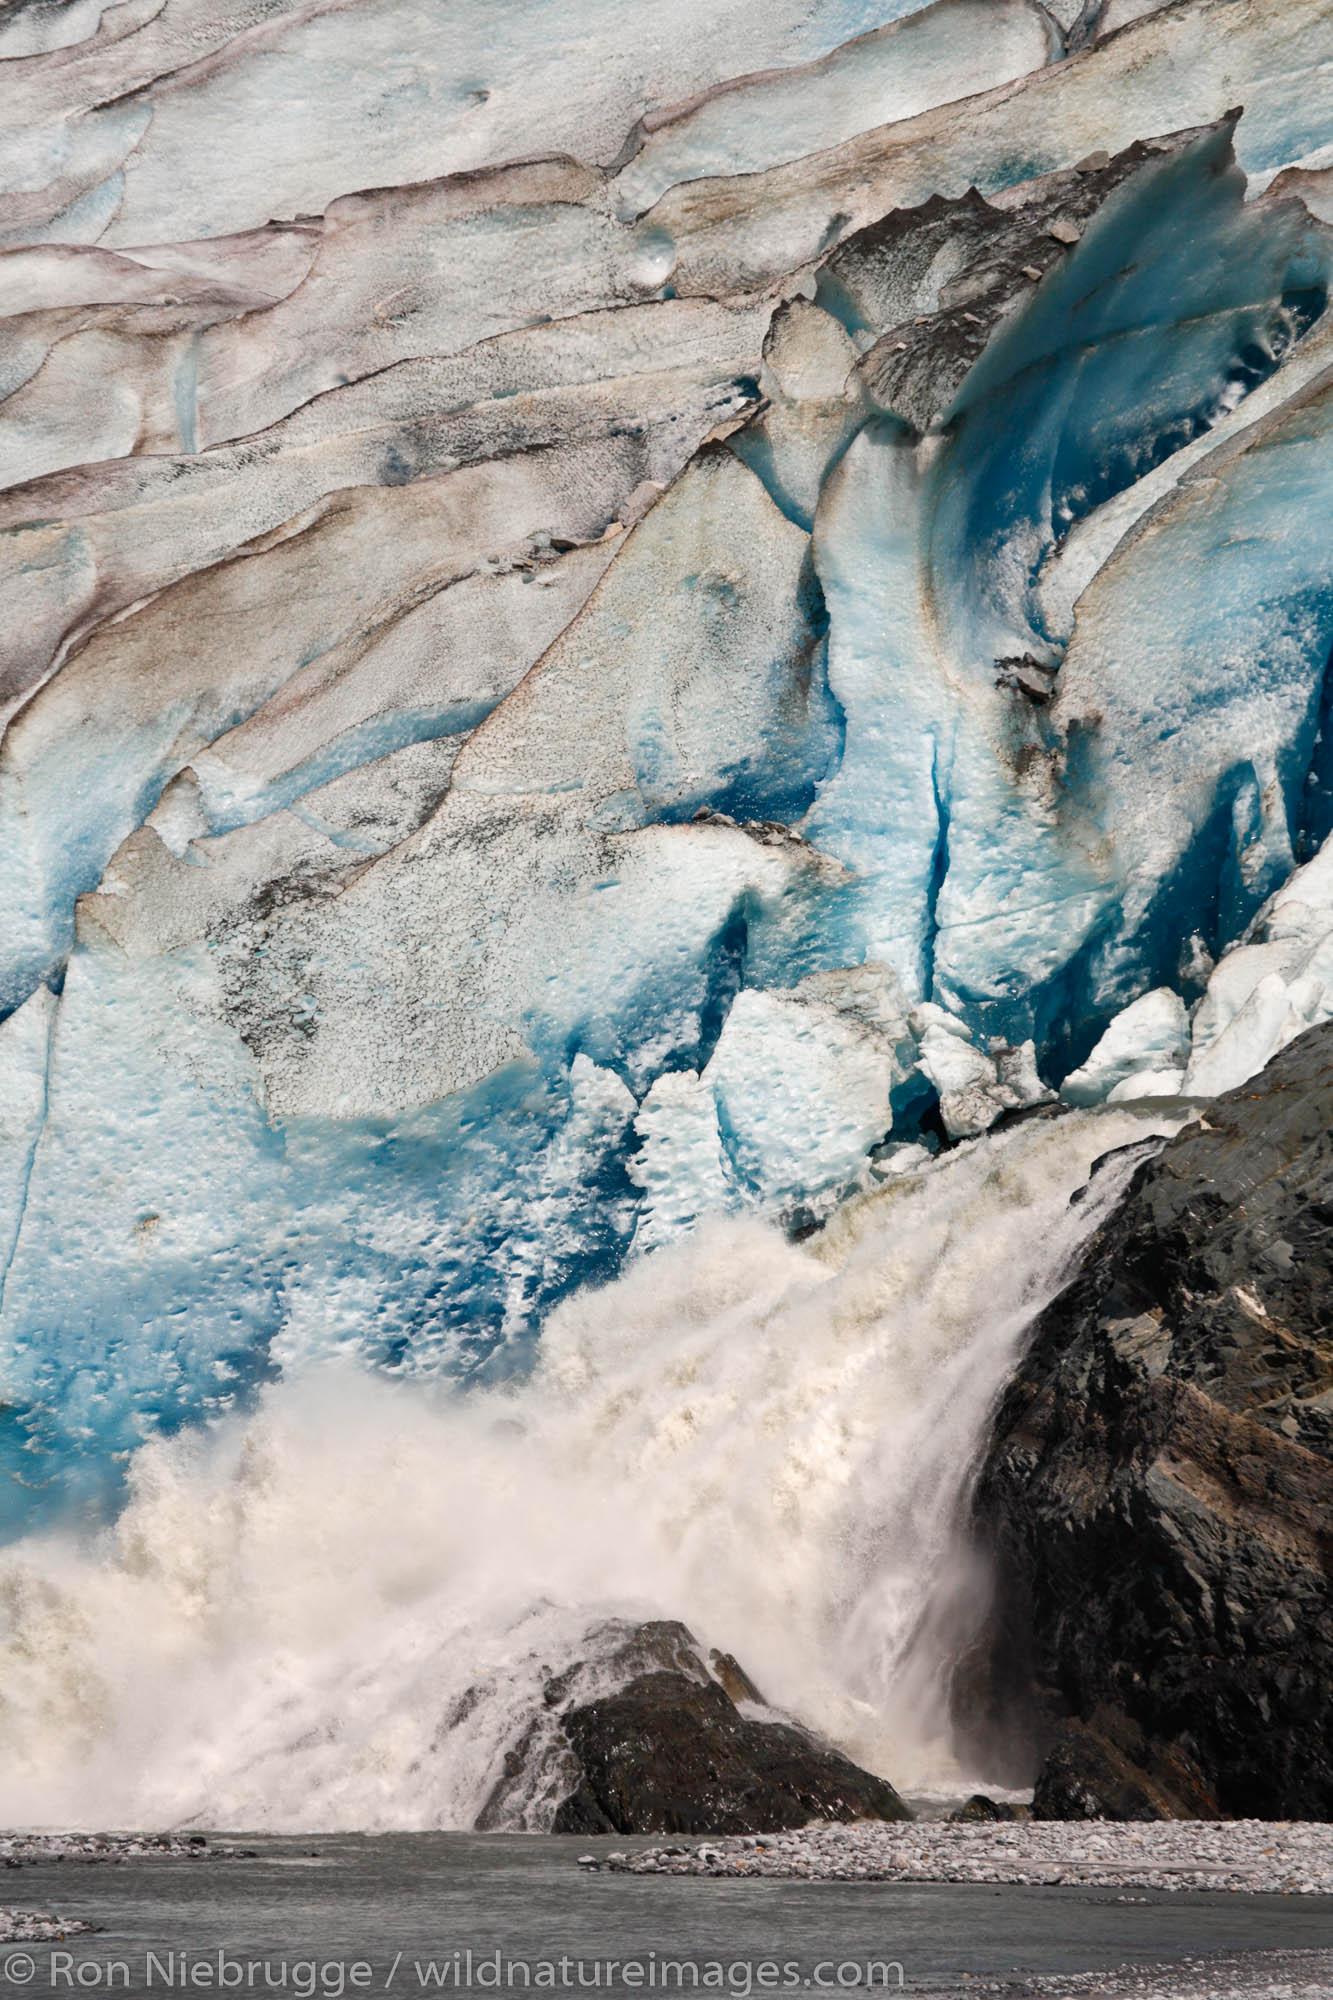 Water rushes from Mendenhall Glacier and into Mendenhall Lake, Juneau, Alaska.